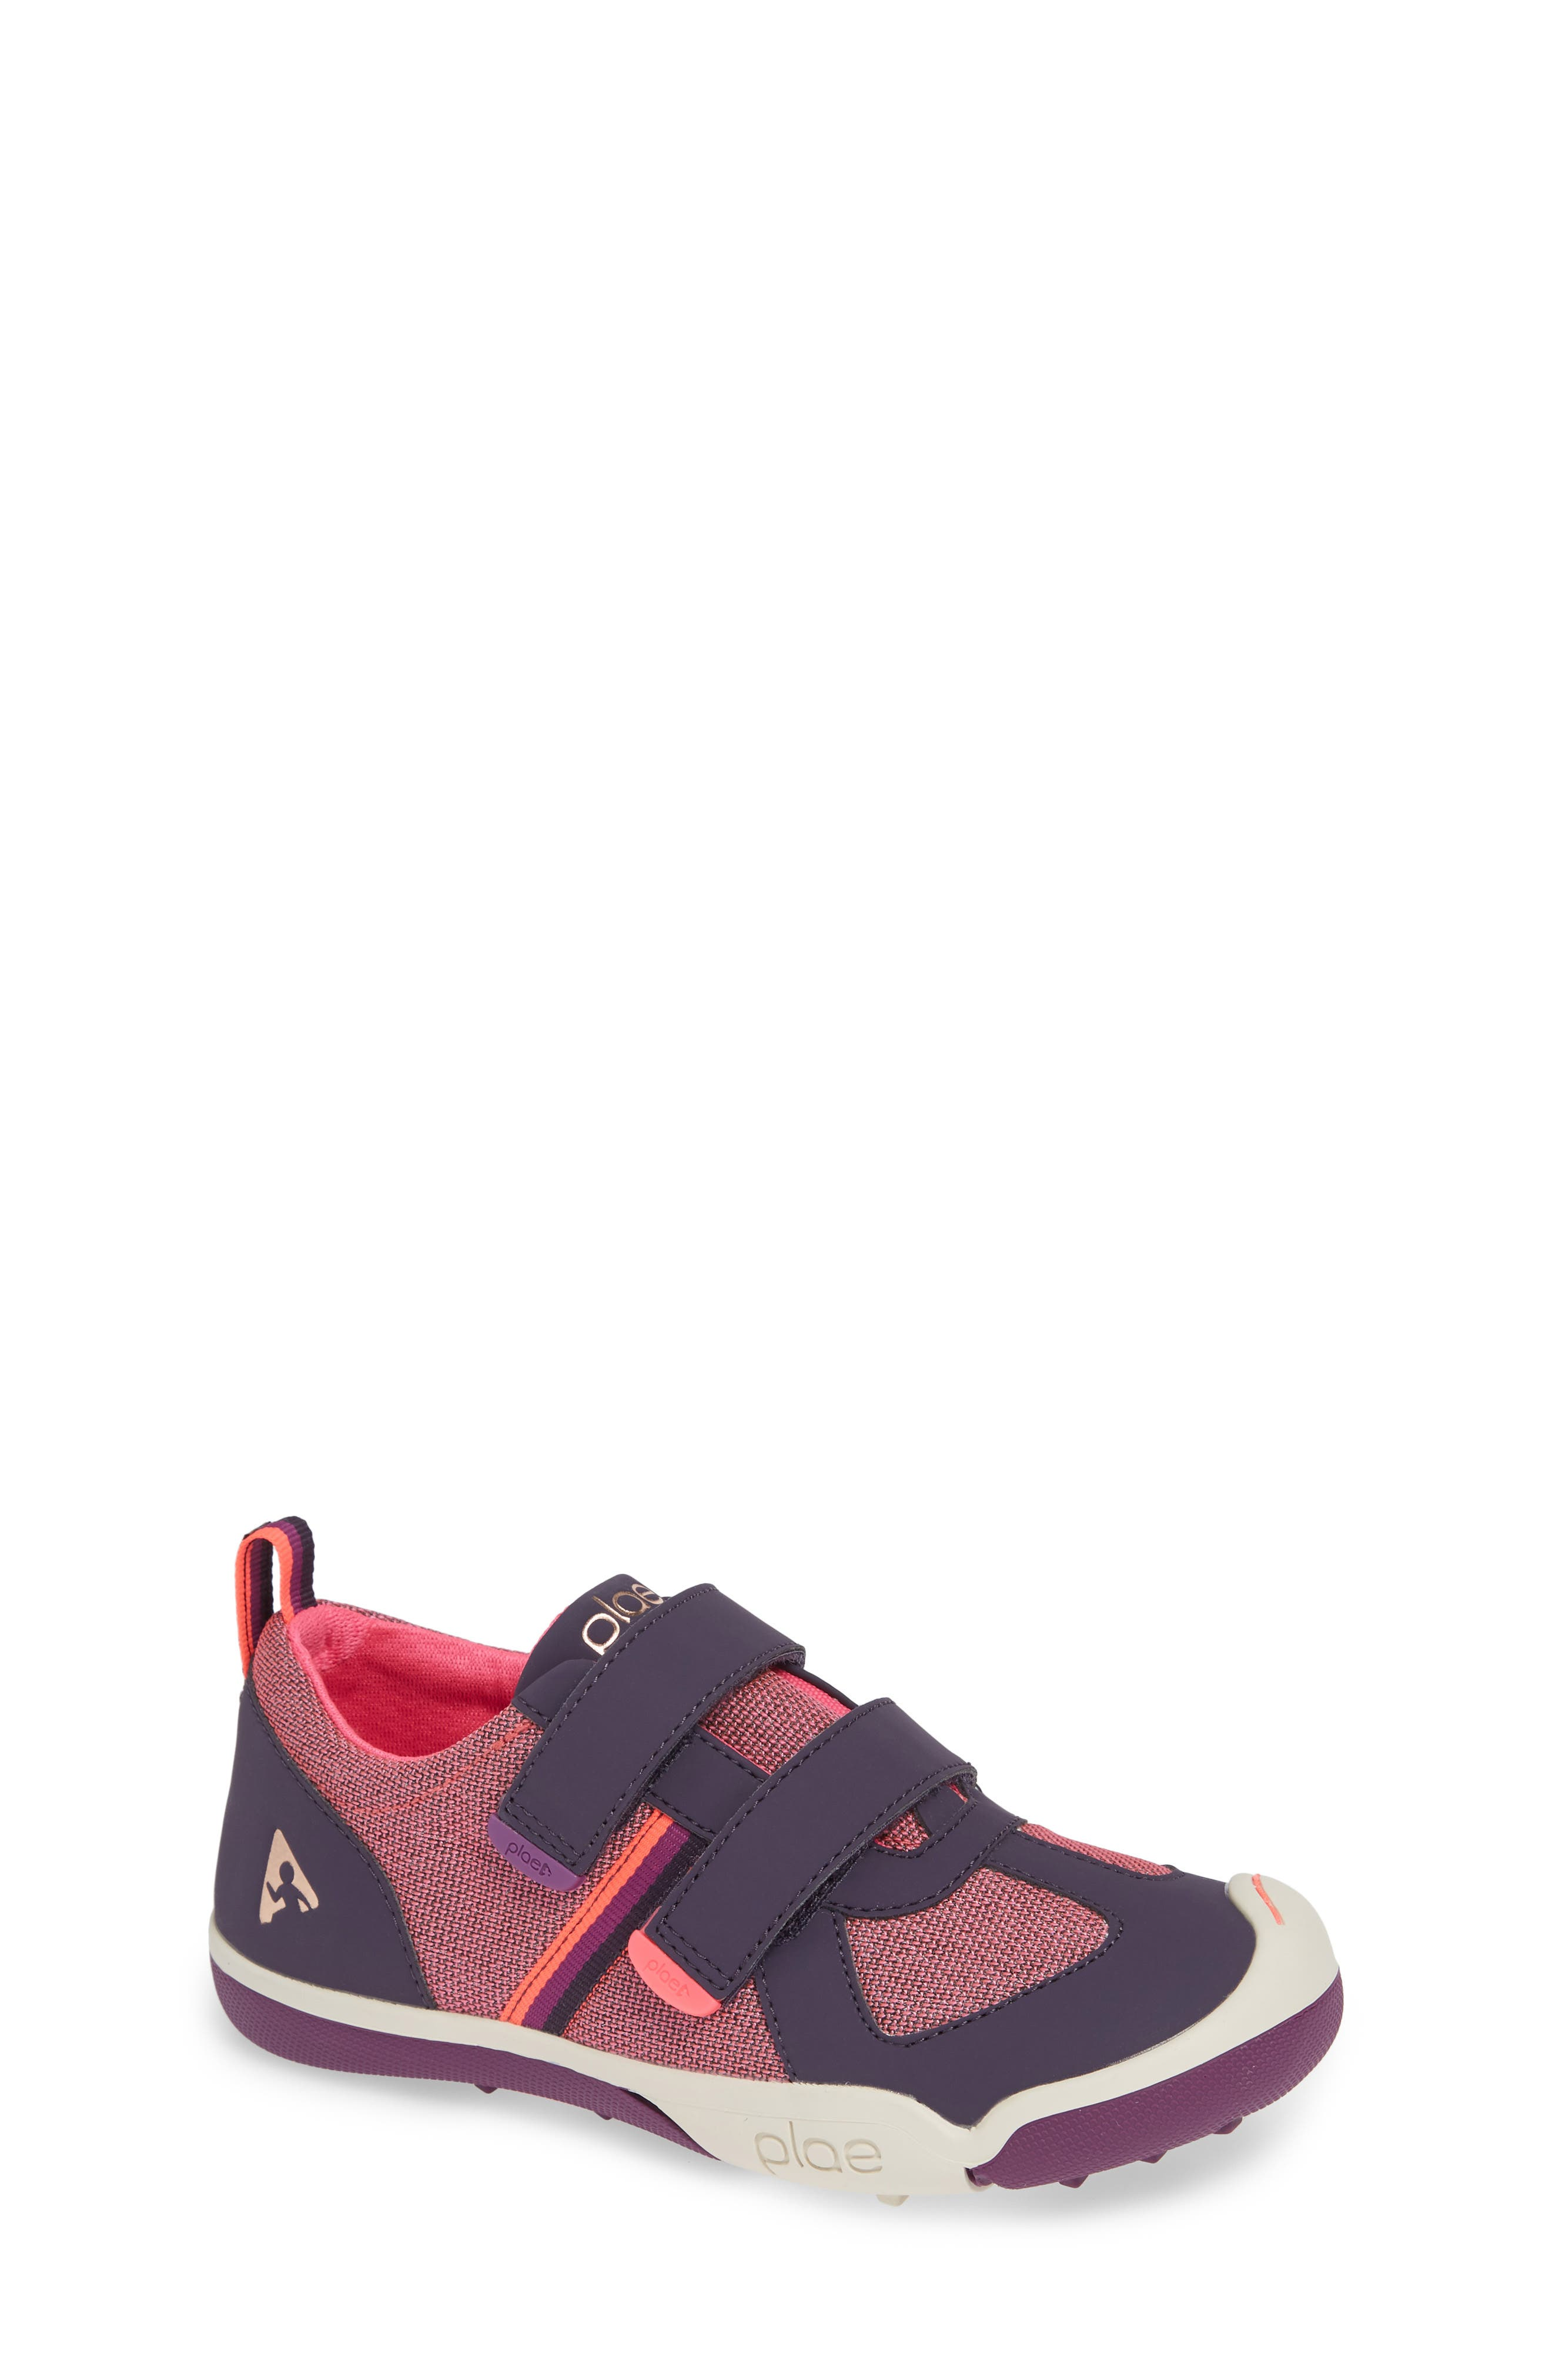 Charlie Customizable Waterproof Sneaker,                             Main thumbnail 1, color,                             MYSTIC BERRY